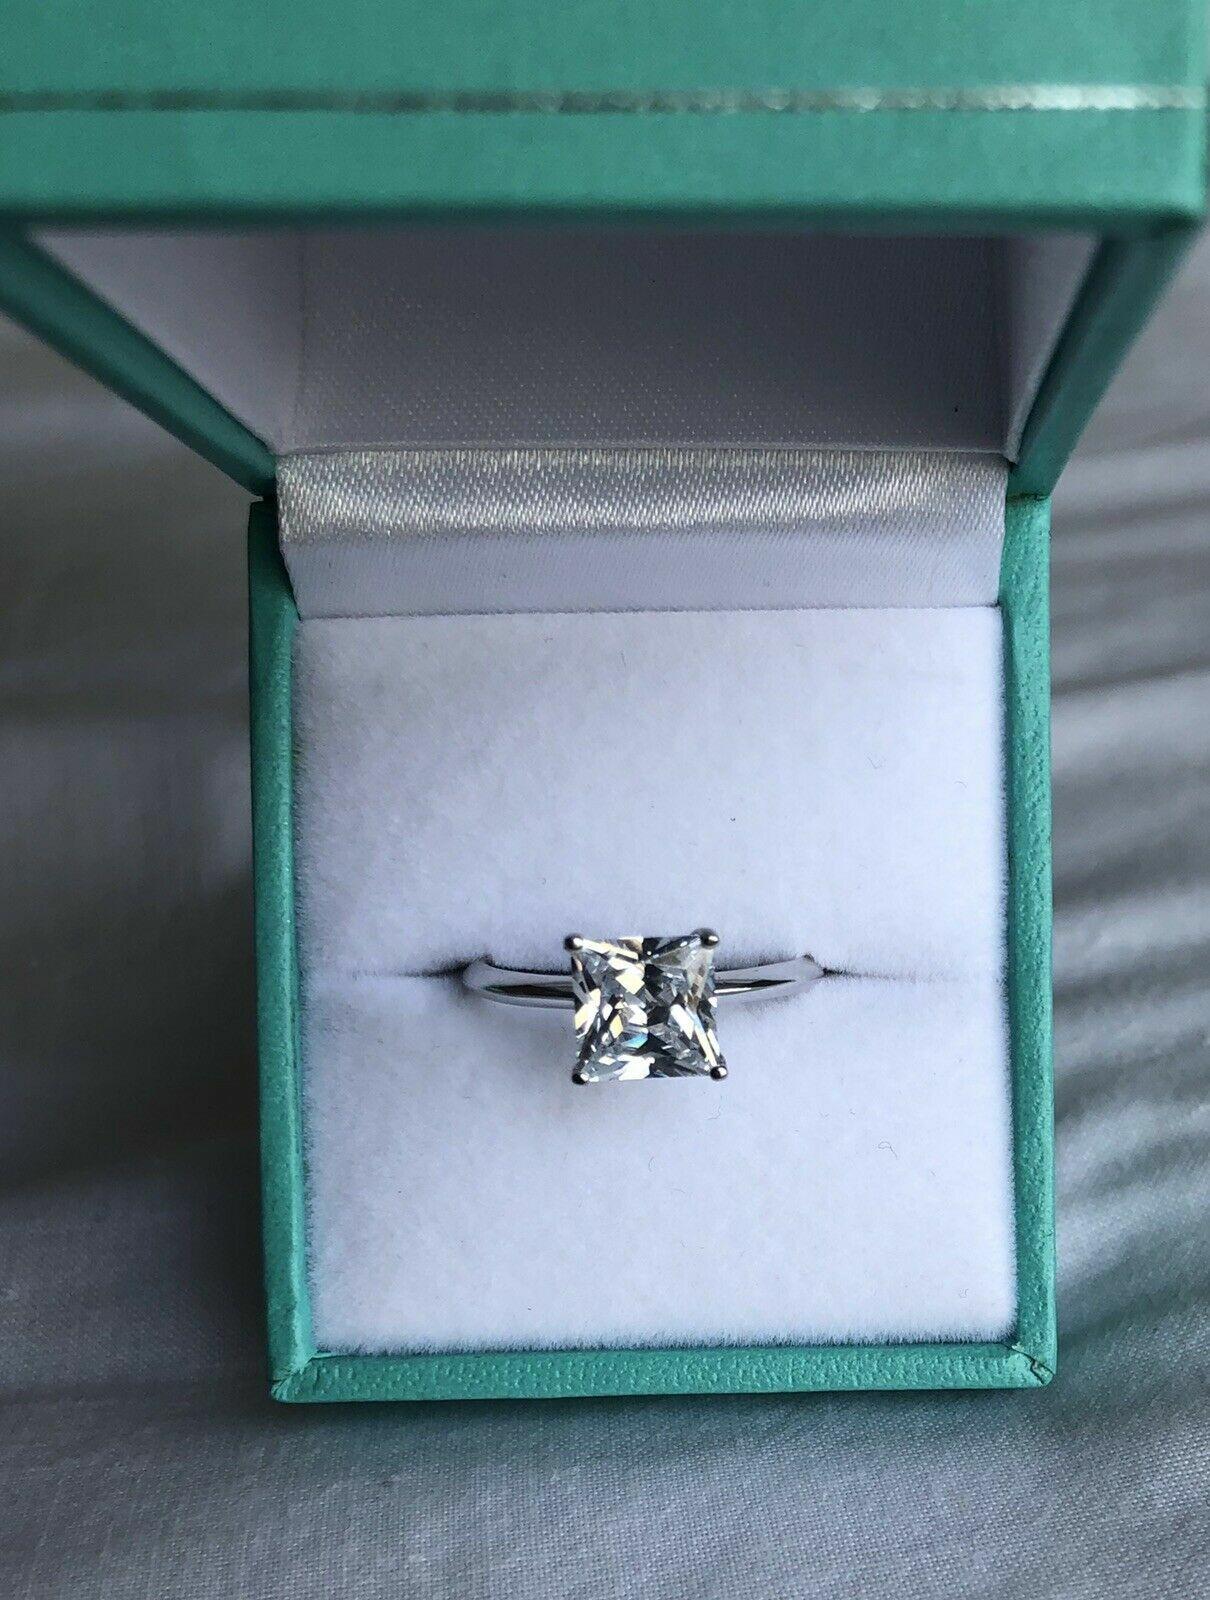 2 CT Princess CUT DIAMOND SOLITAIRE ENGAGEMENT RING 14K WHIT